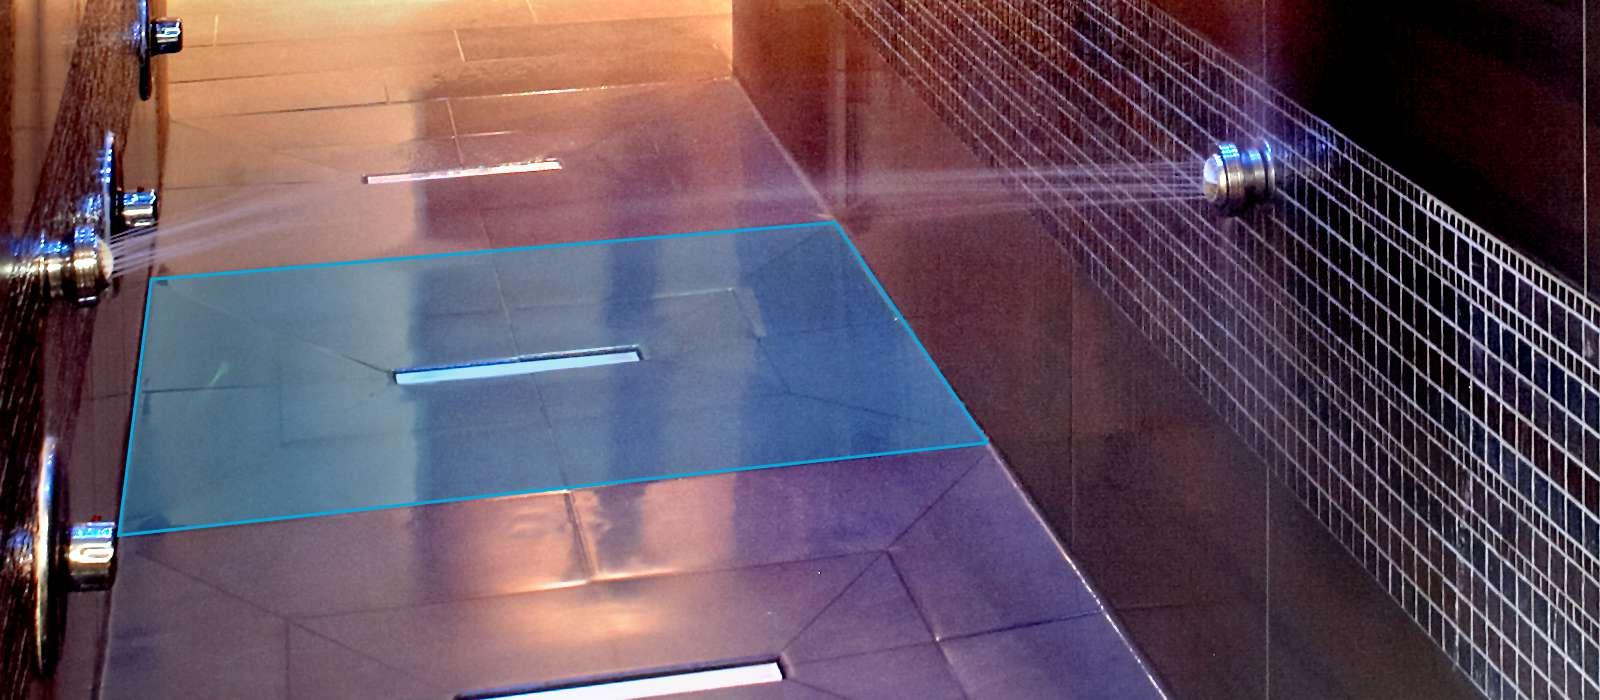 wedi fundo riofino floor level shower element with linear drainageleaking shower bathroom. Black Bedroom Furniture Sets. Home Design Ideas